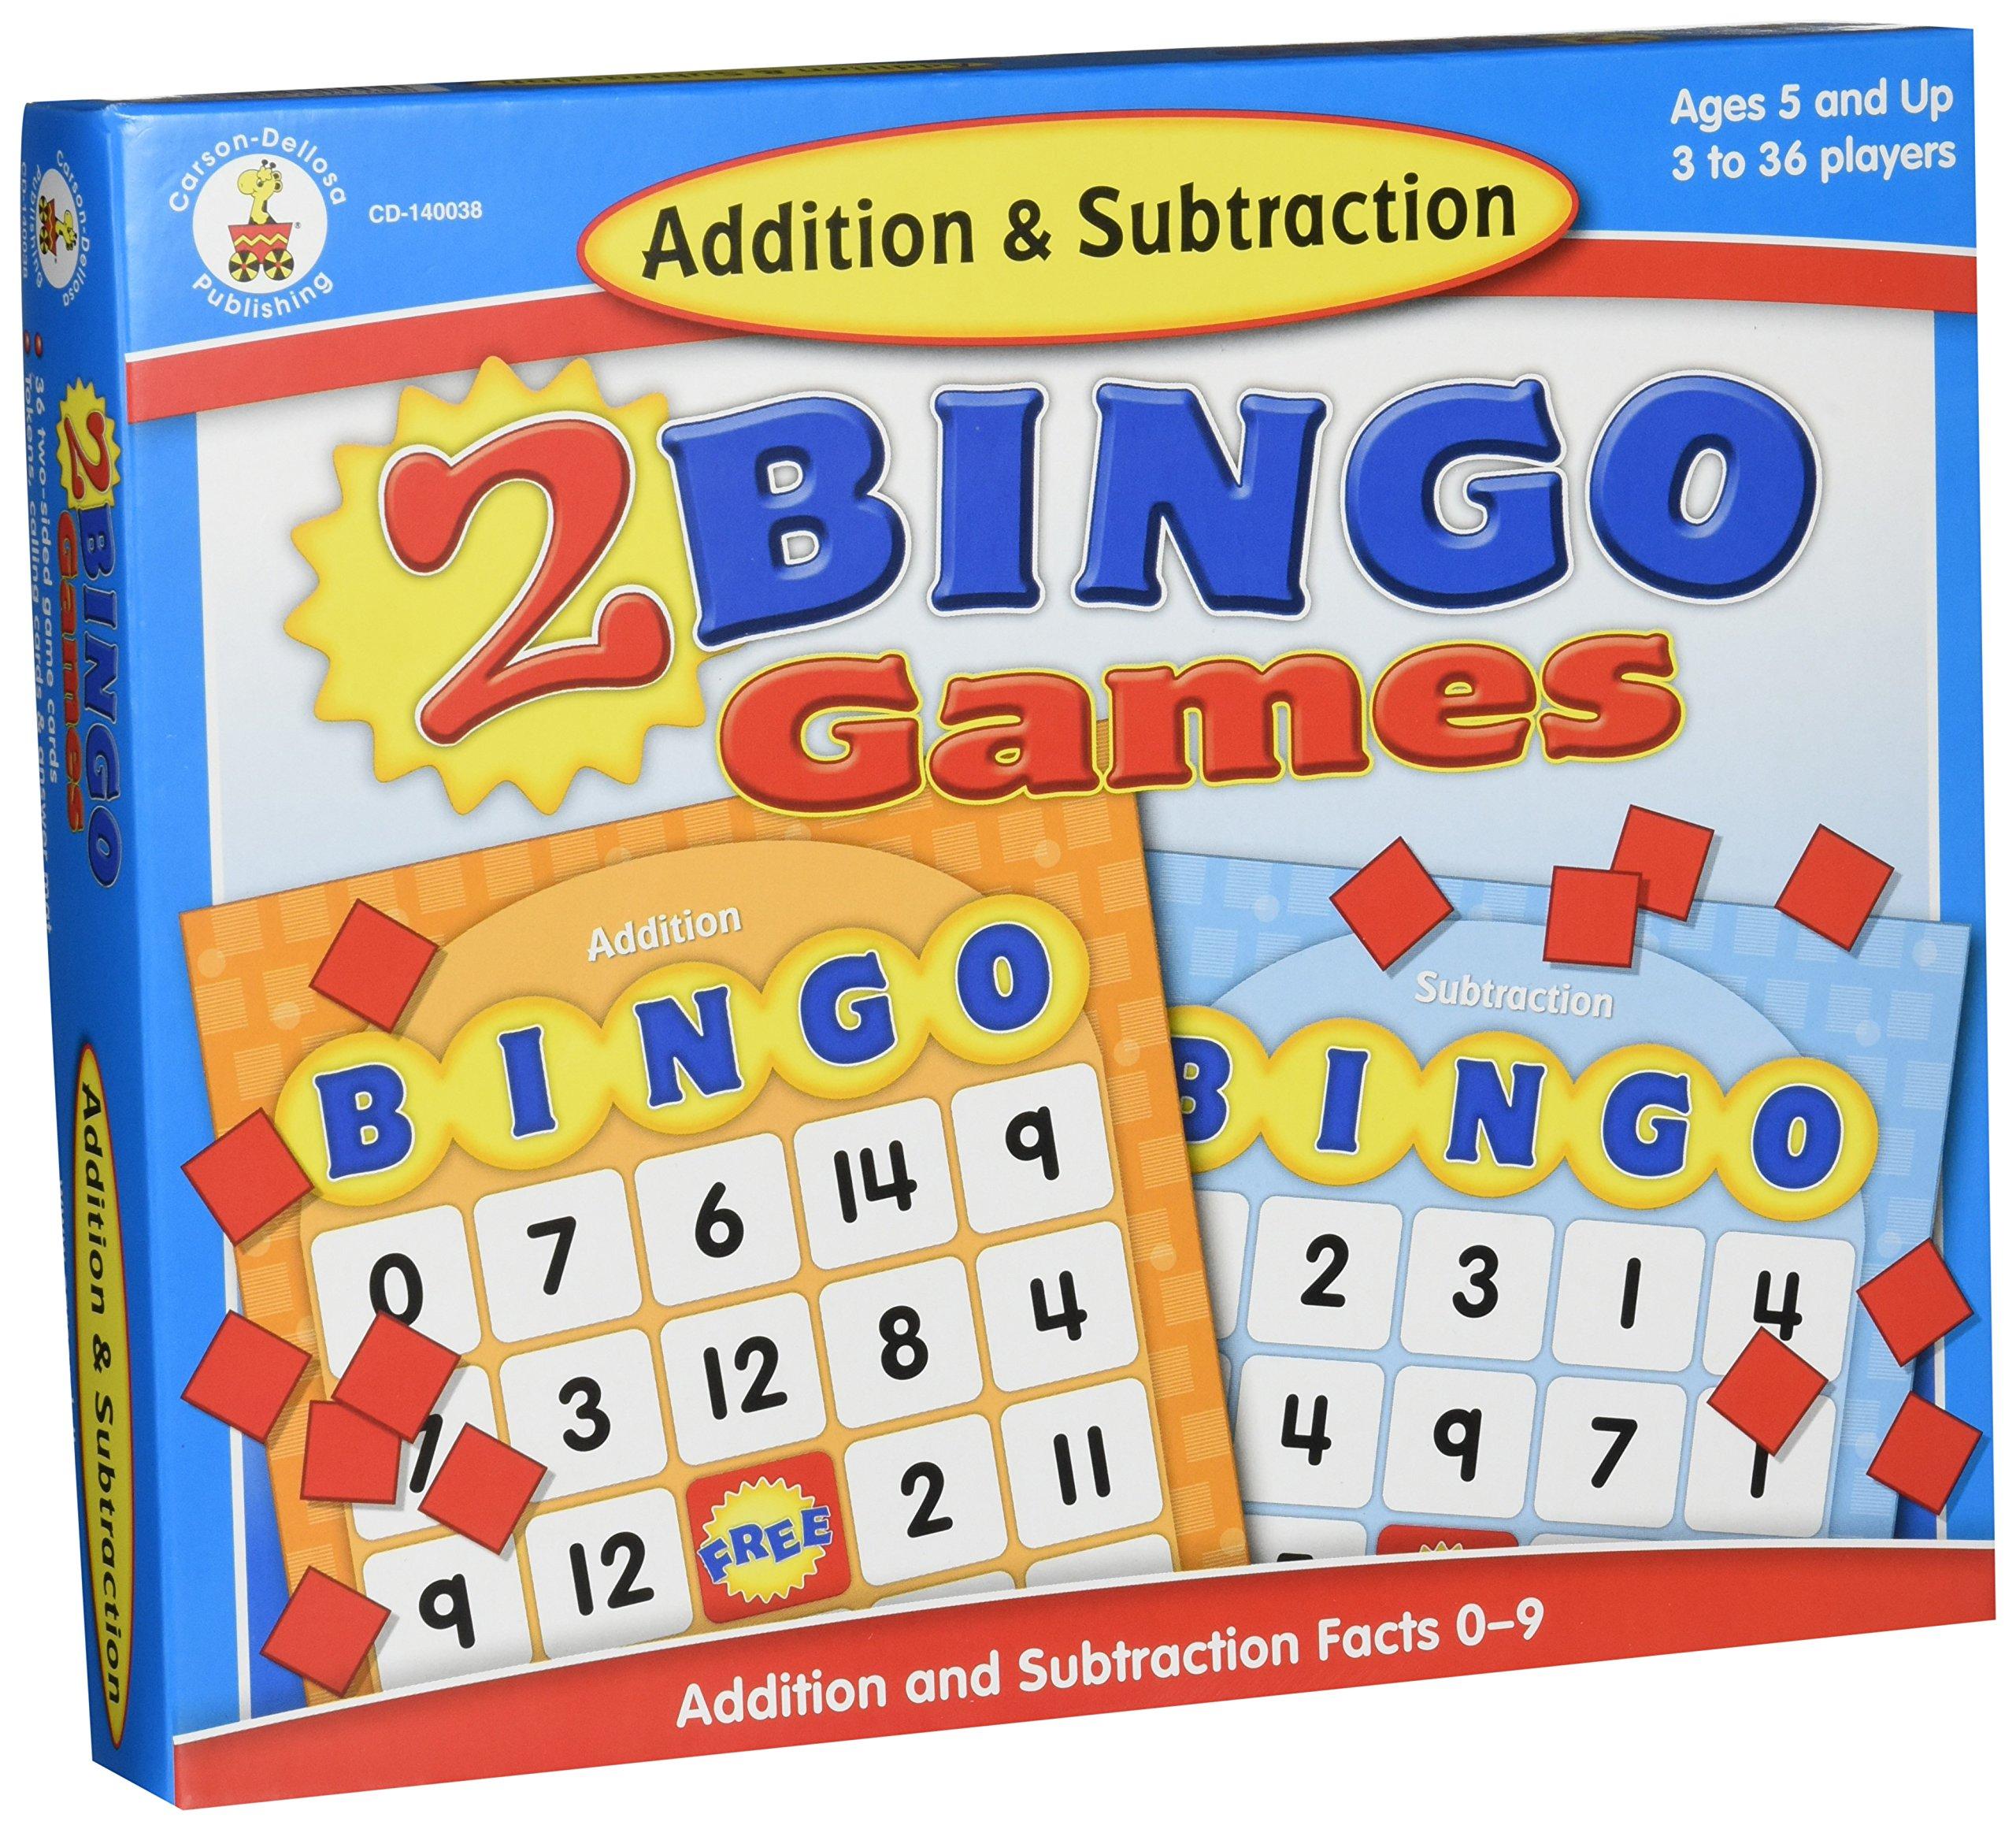 Carson-Dellosa Addition and Subtraction Bingo Board Games (140038) Ages 7 and Up